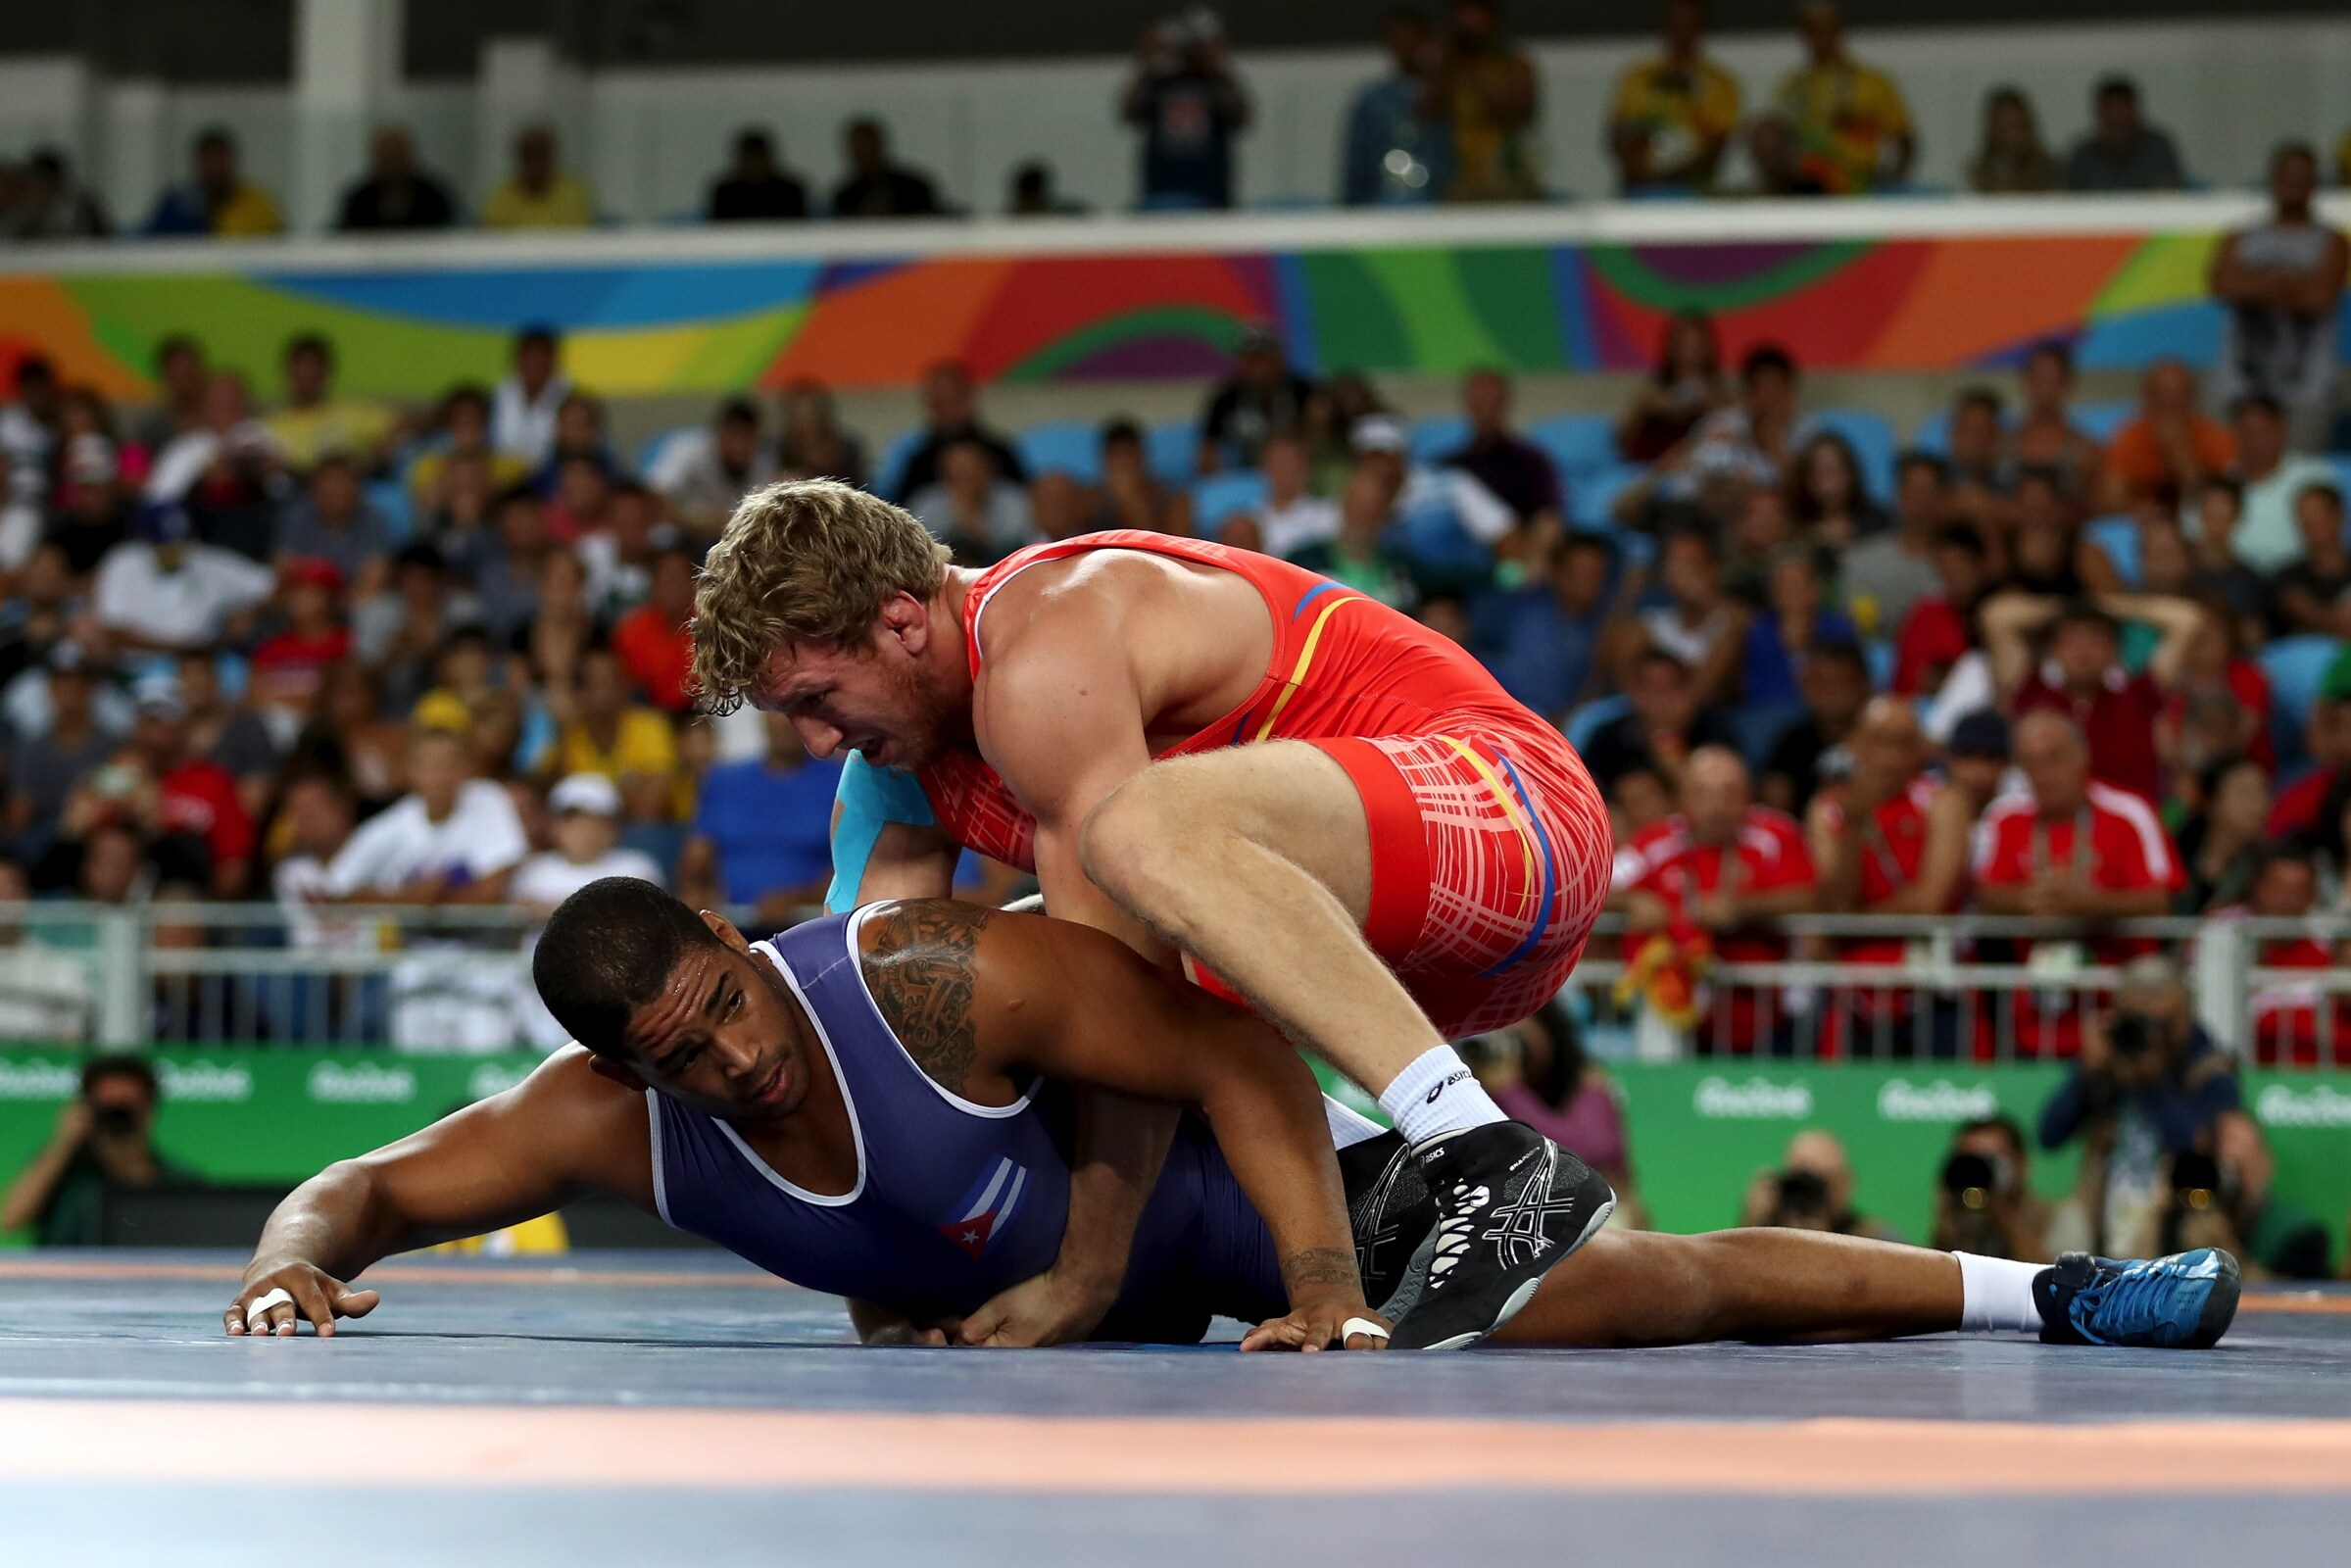 Wrestling - Greco-Roman 98kg Men